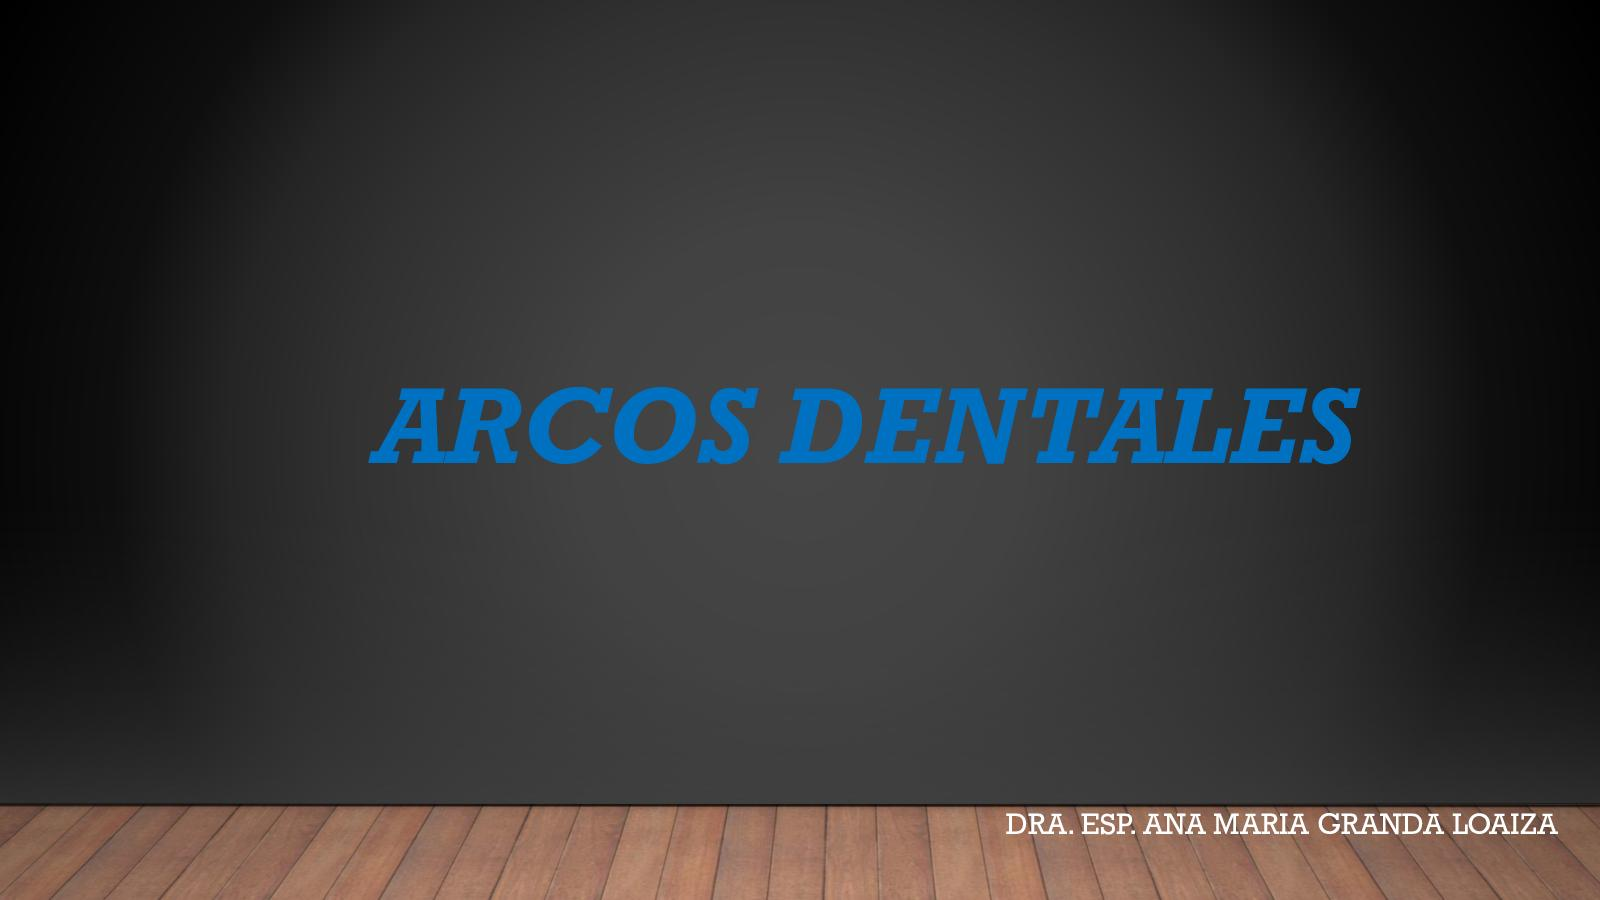 Arcos Dentales